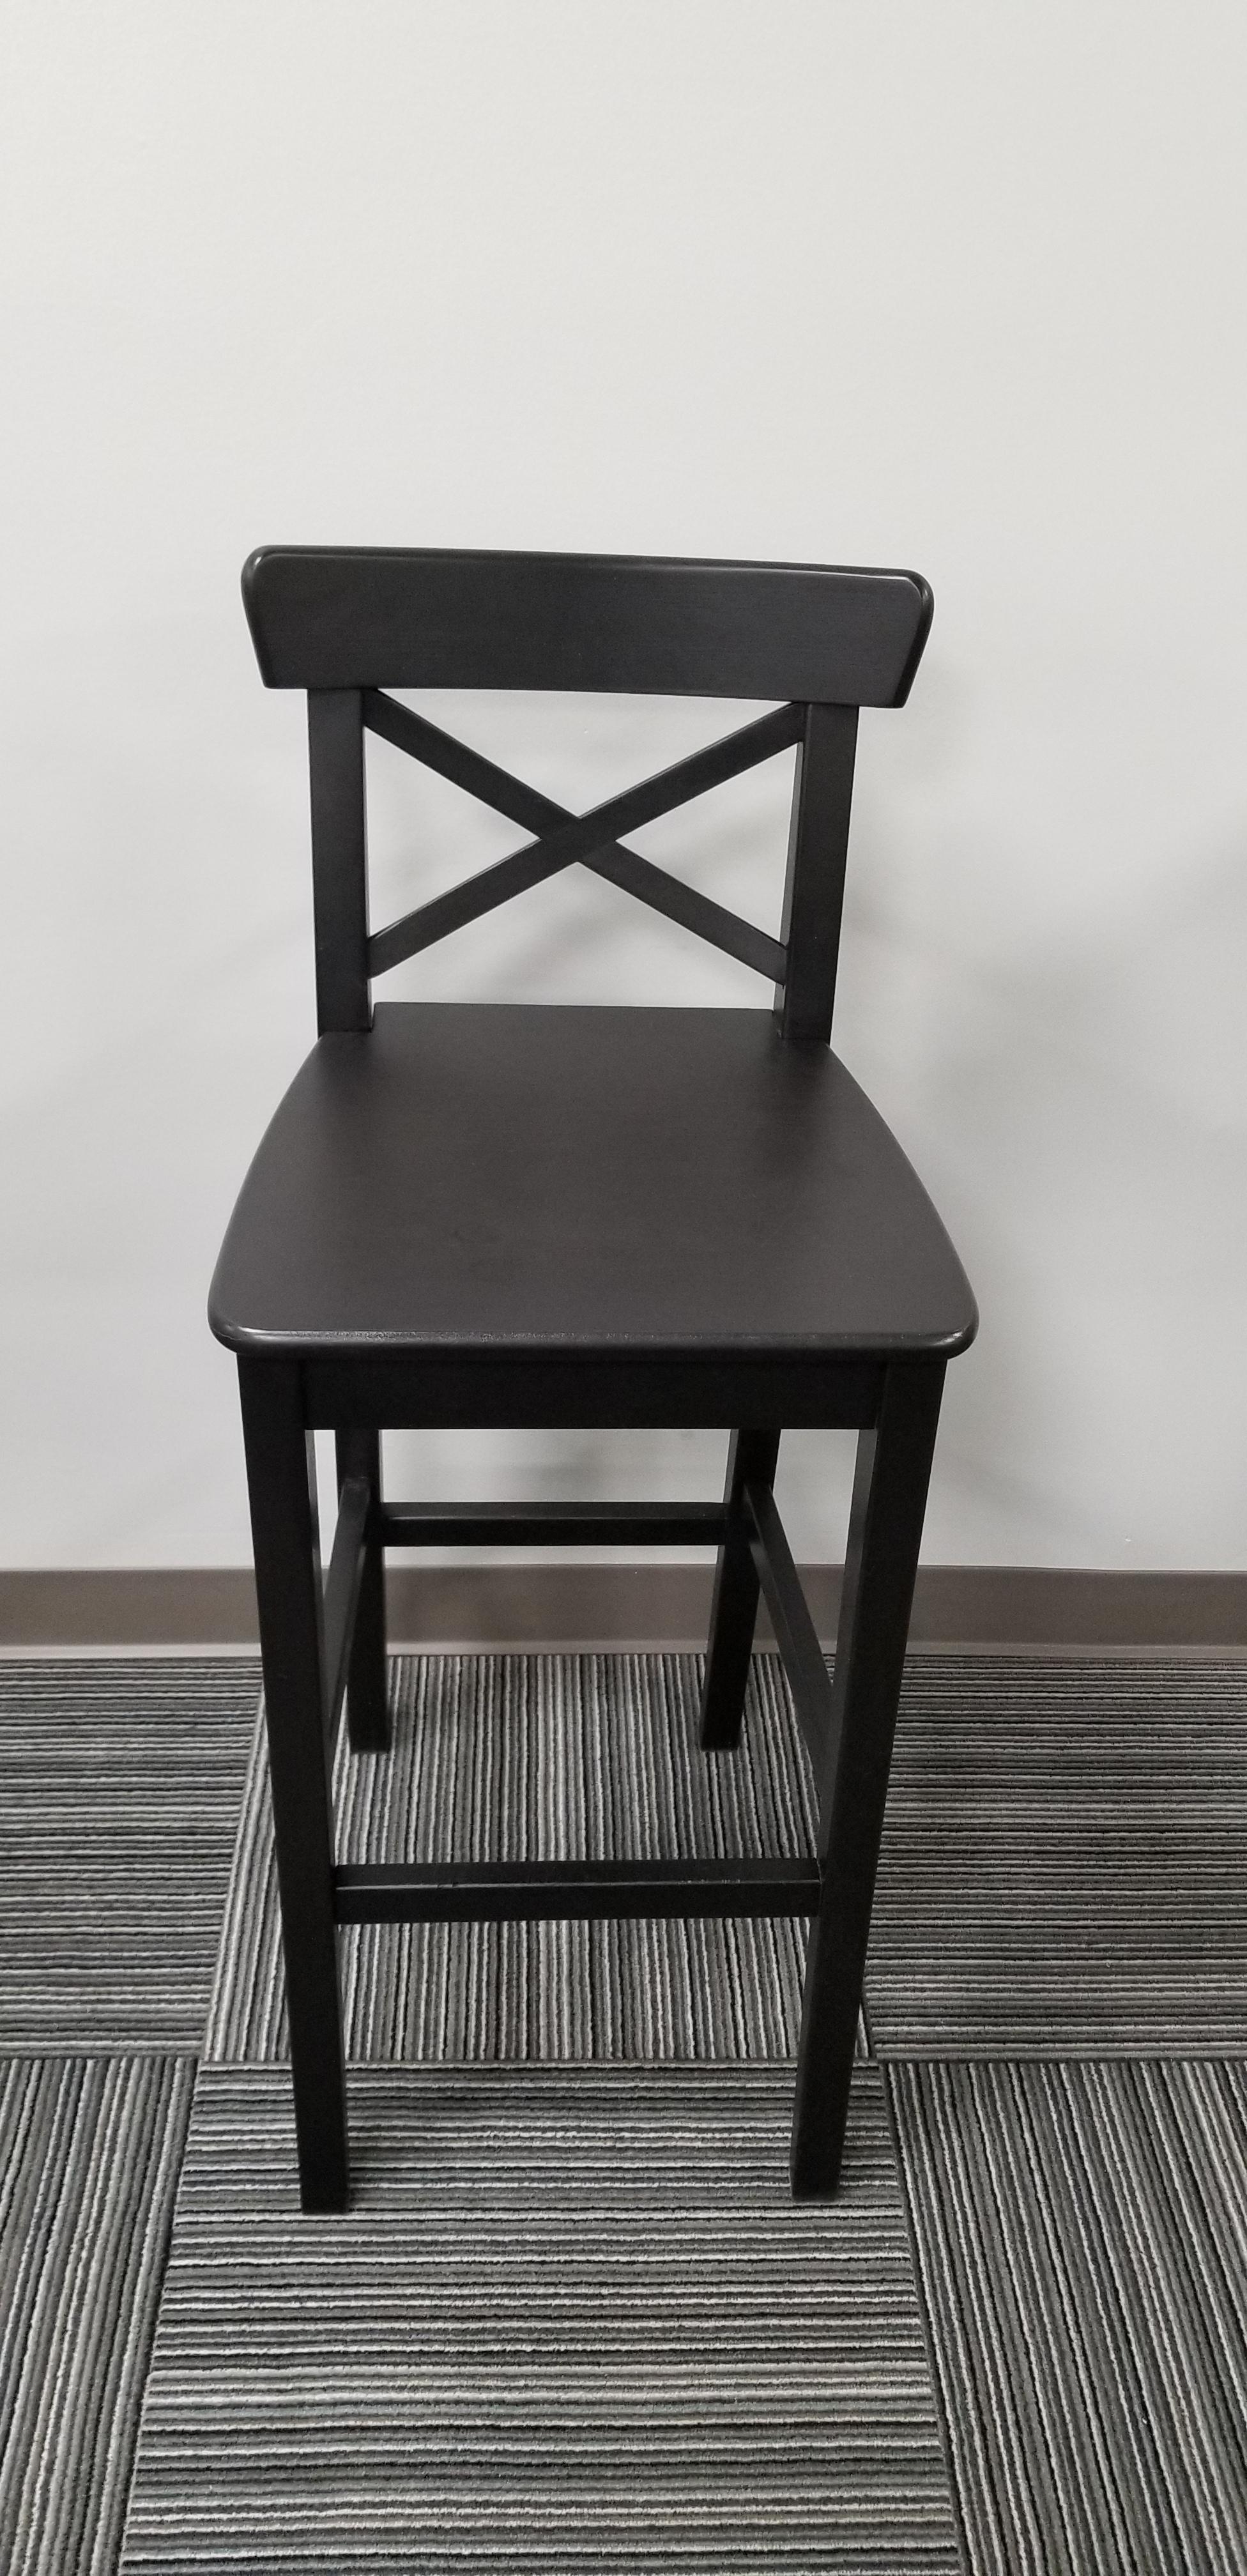 Super Black Wood Bar Stool Spiritservingveterans Wood Chair Design Ideas Spiritservingveteransorg